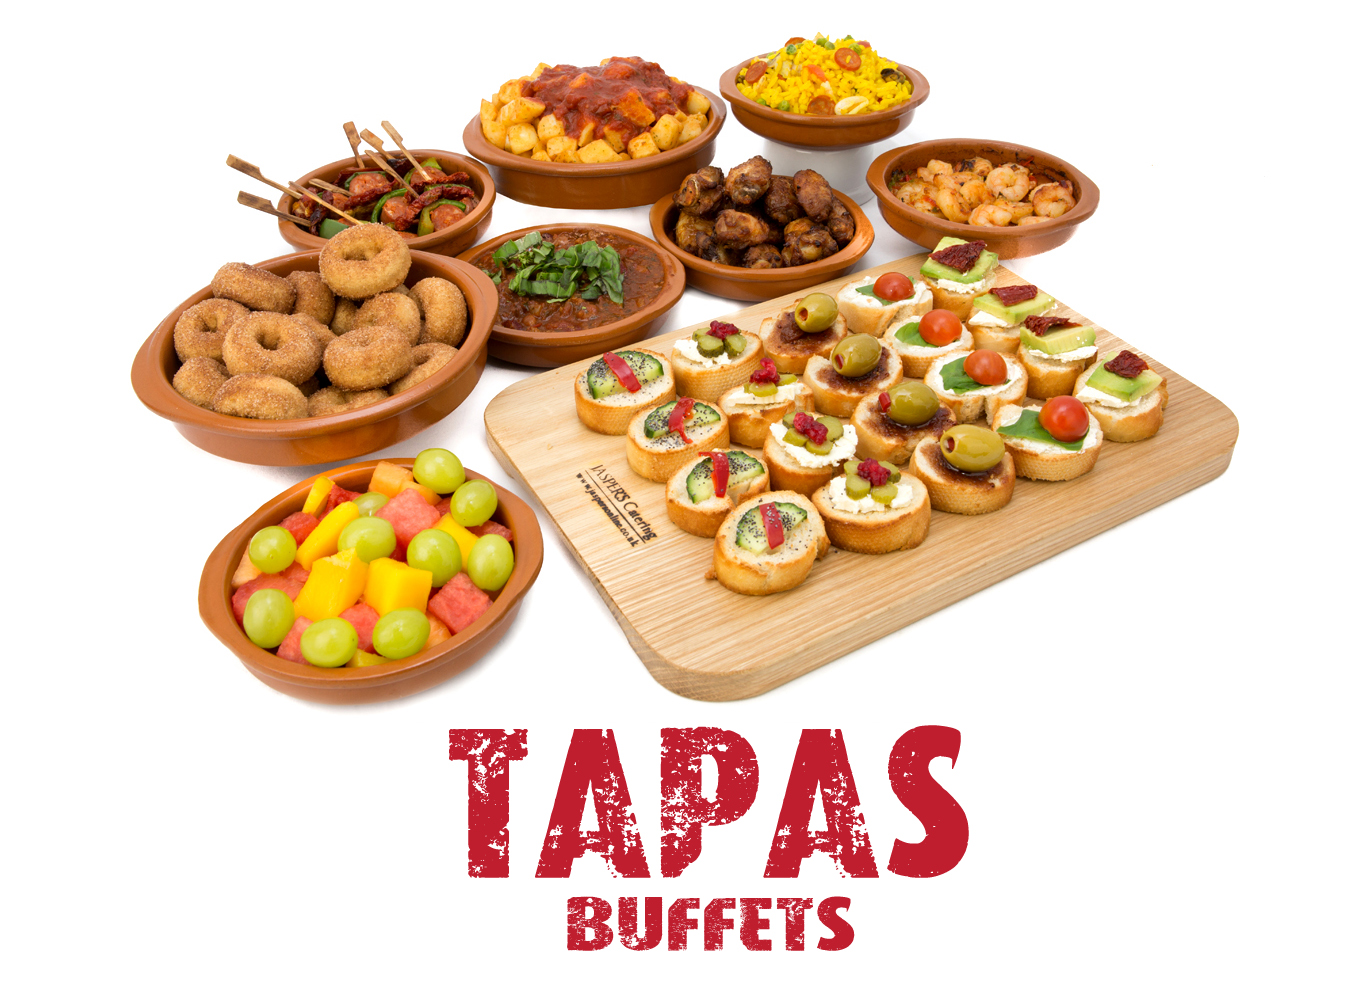 Jaspers tapas buffet menus for Catering companies